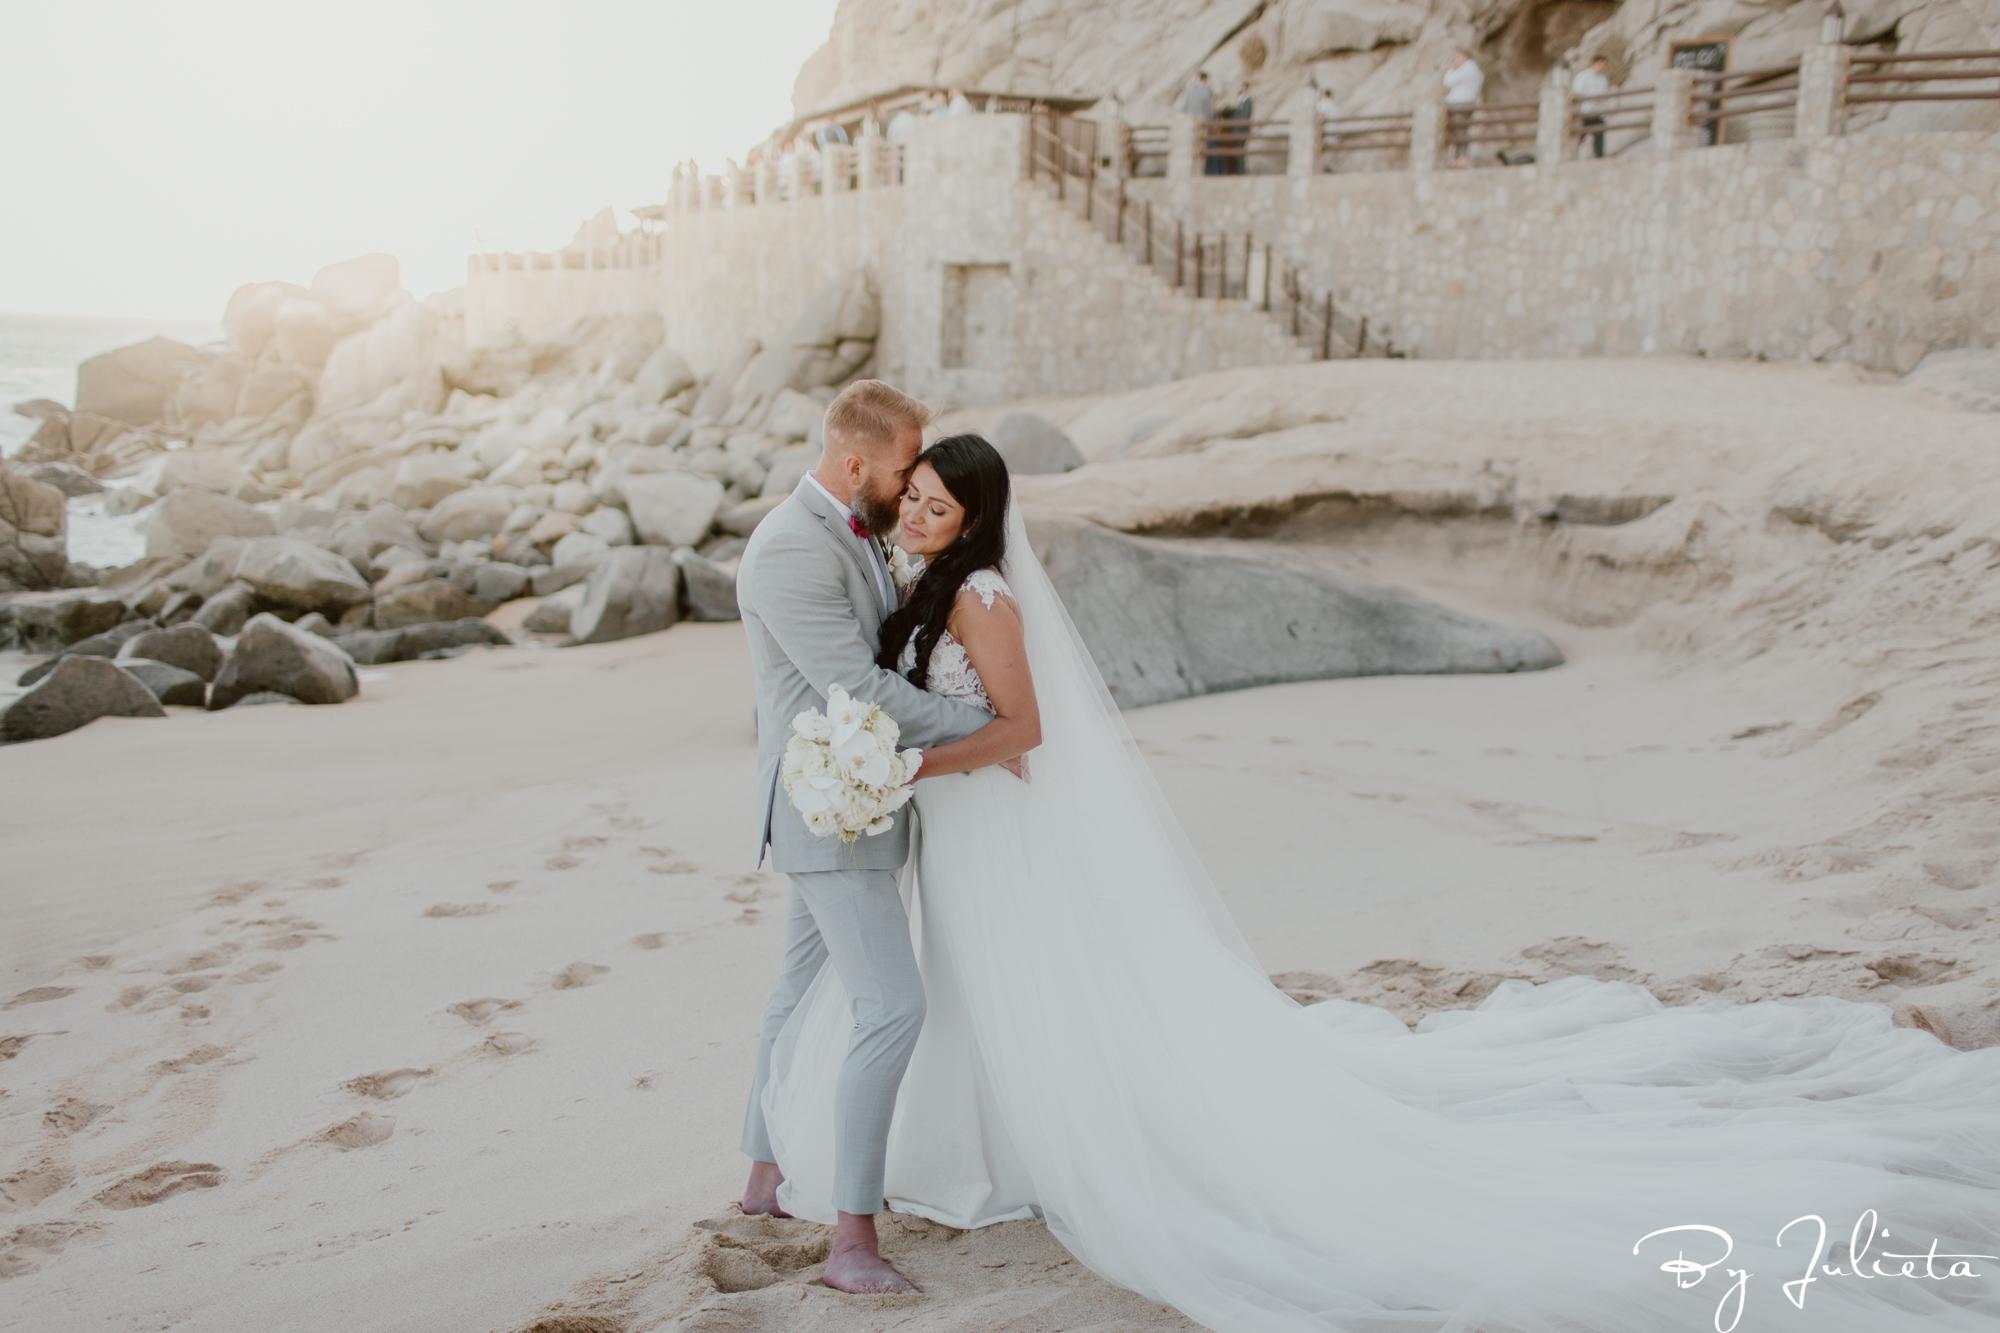 The Resort at Pedregal Wedding. T+C. Julieta Amezcua Photography.570.JPG